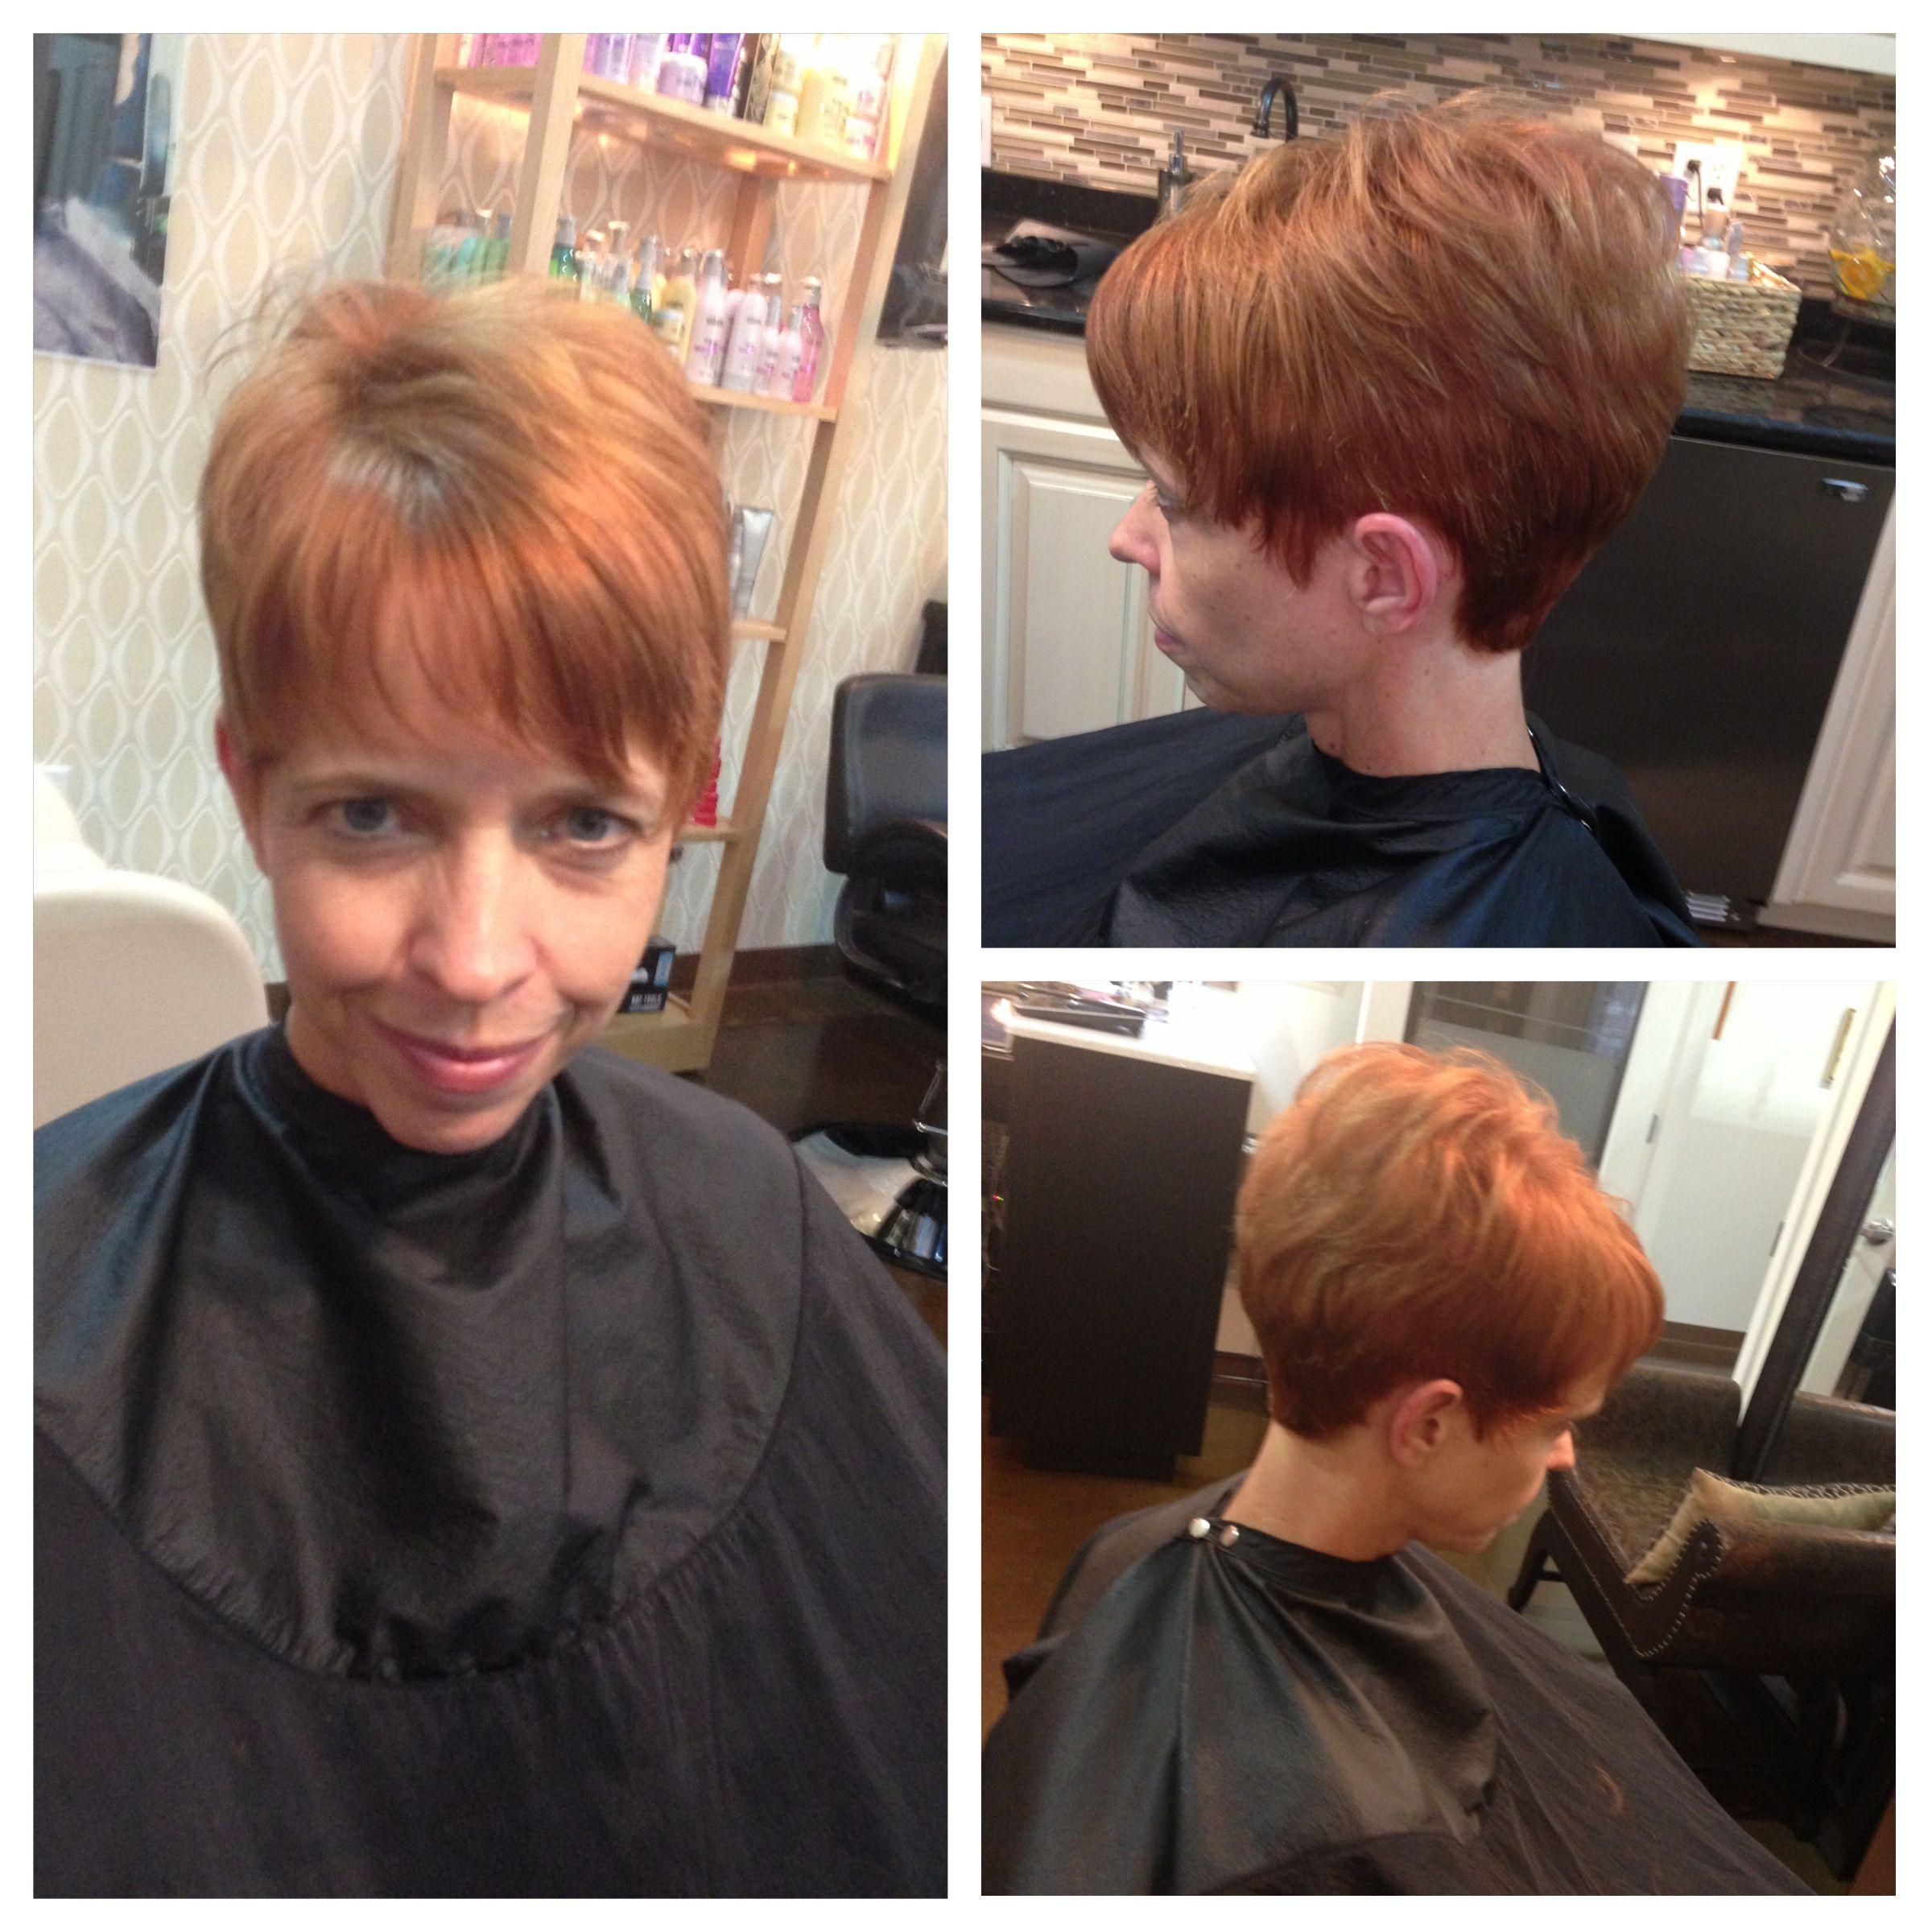 Color haircut & treatment by Lezlie Lumpkin Price at Z Nevaeh Salon